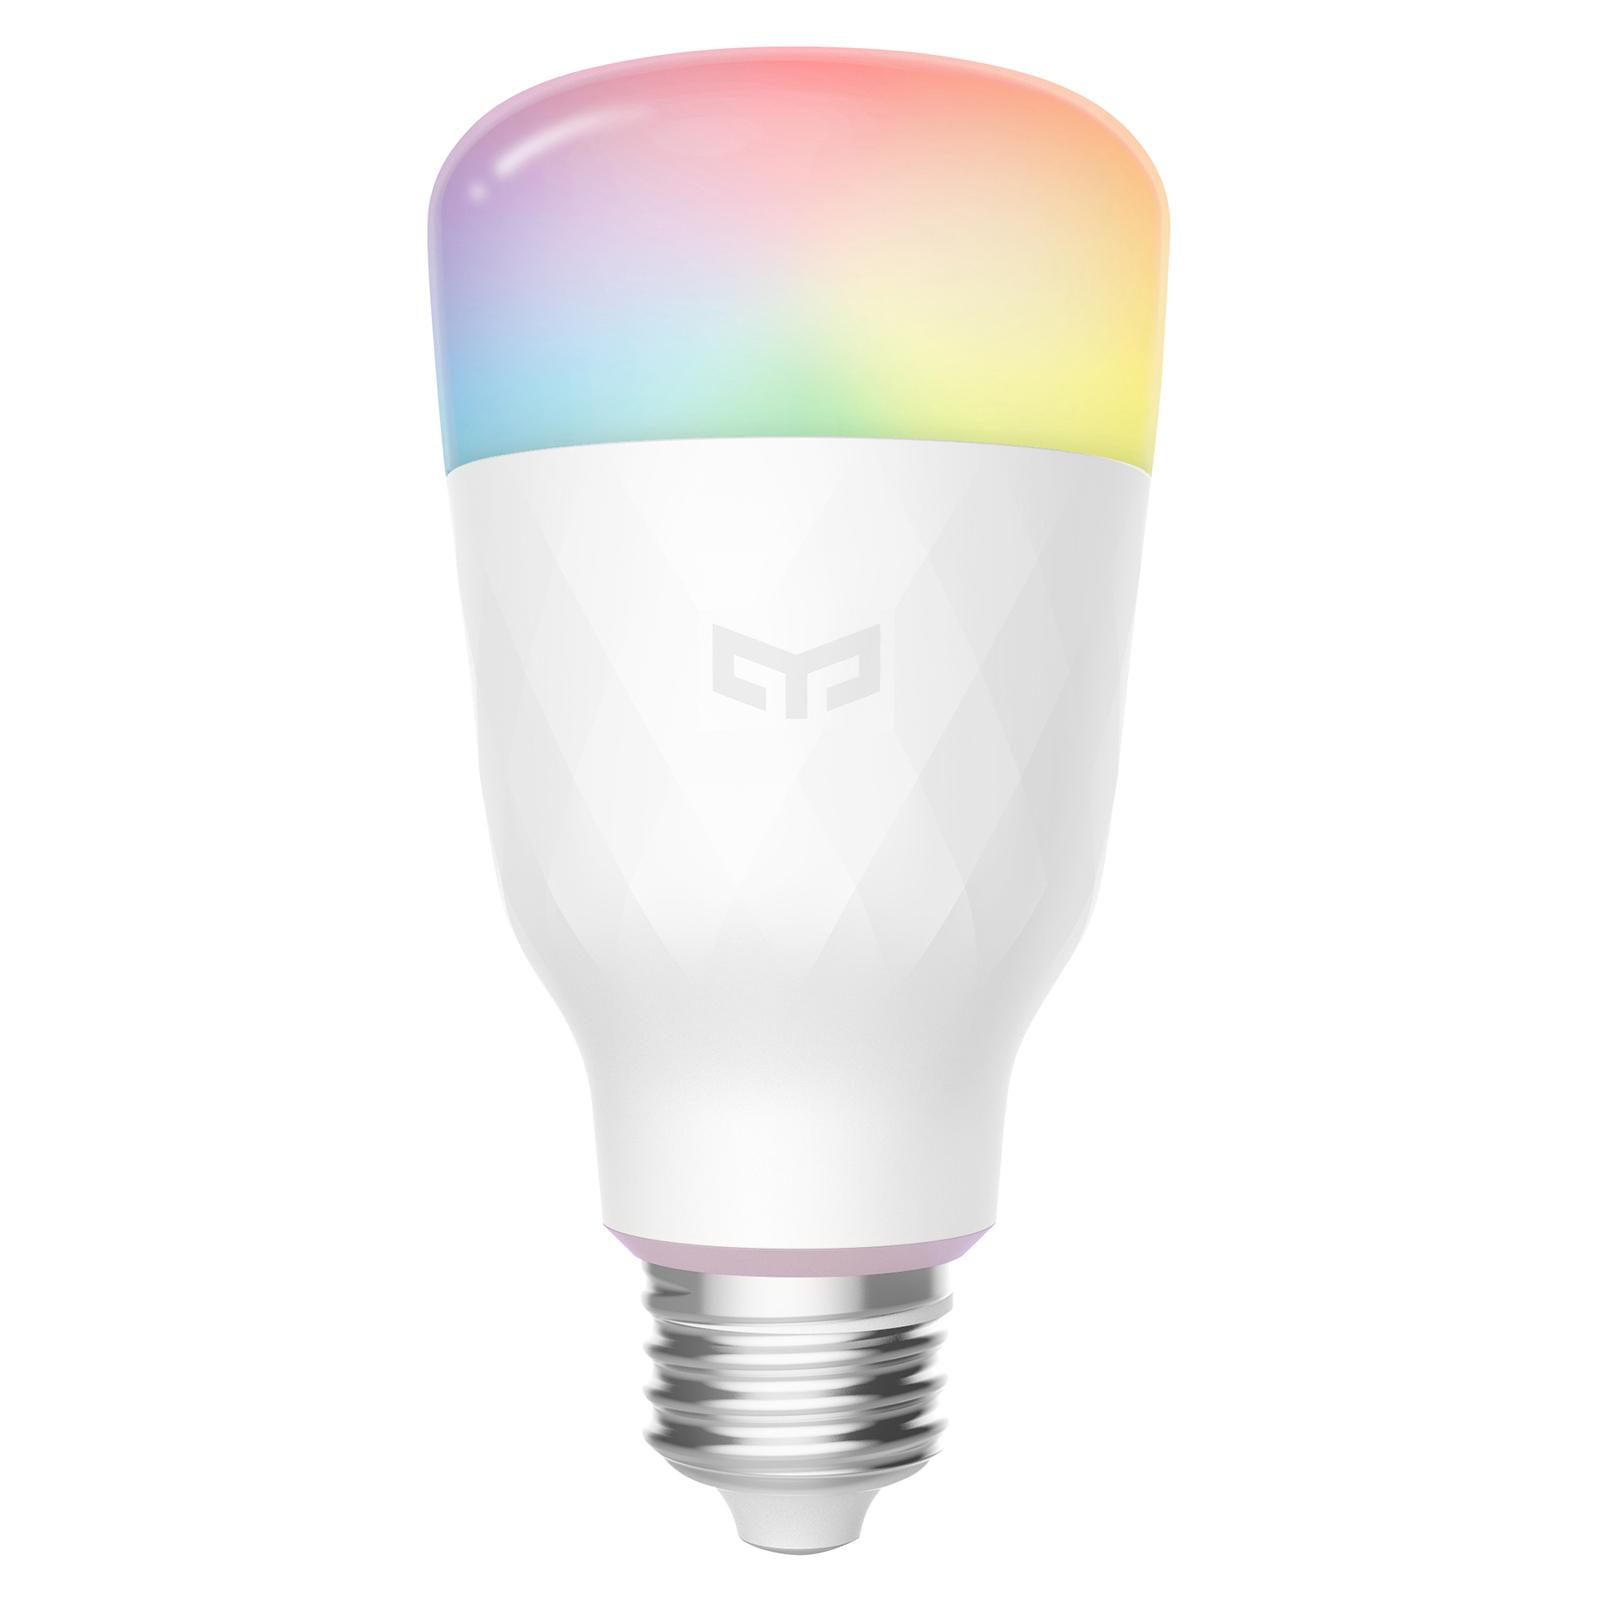 Yeelight Smart LED E27 1S Color 8,5W dimming